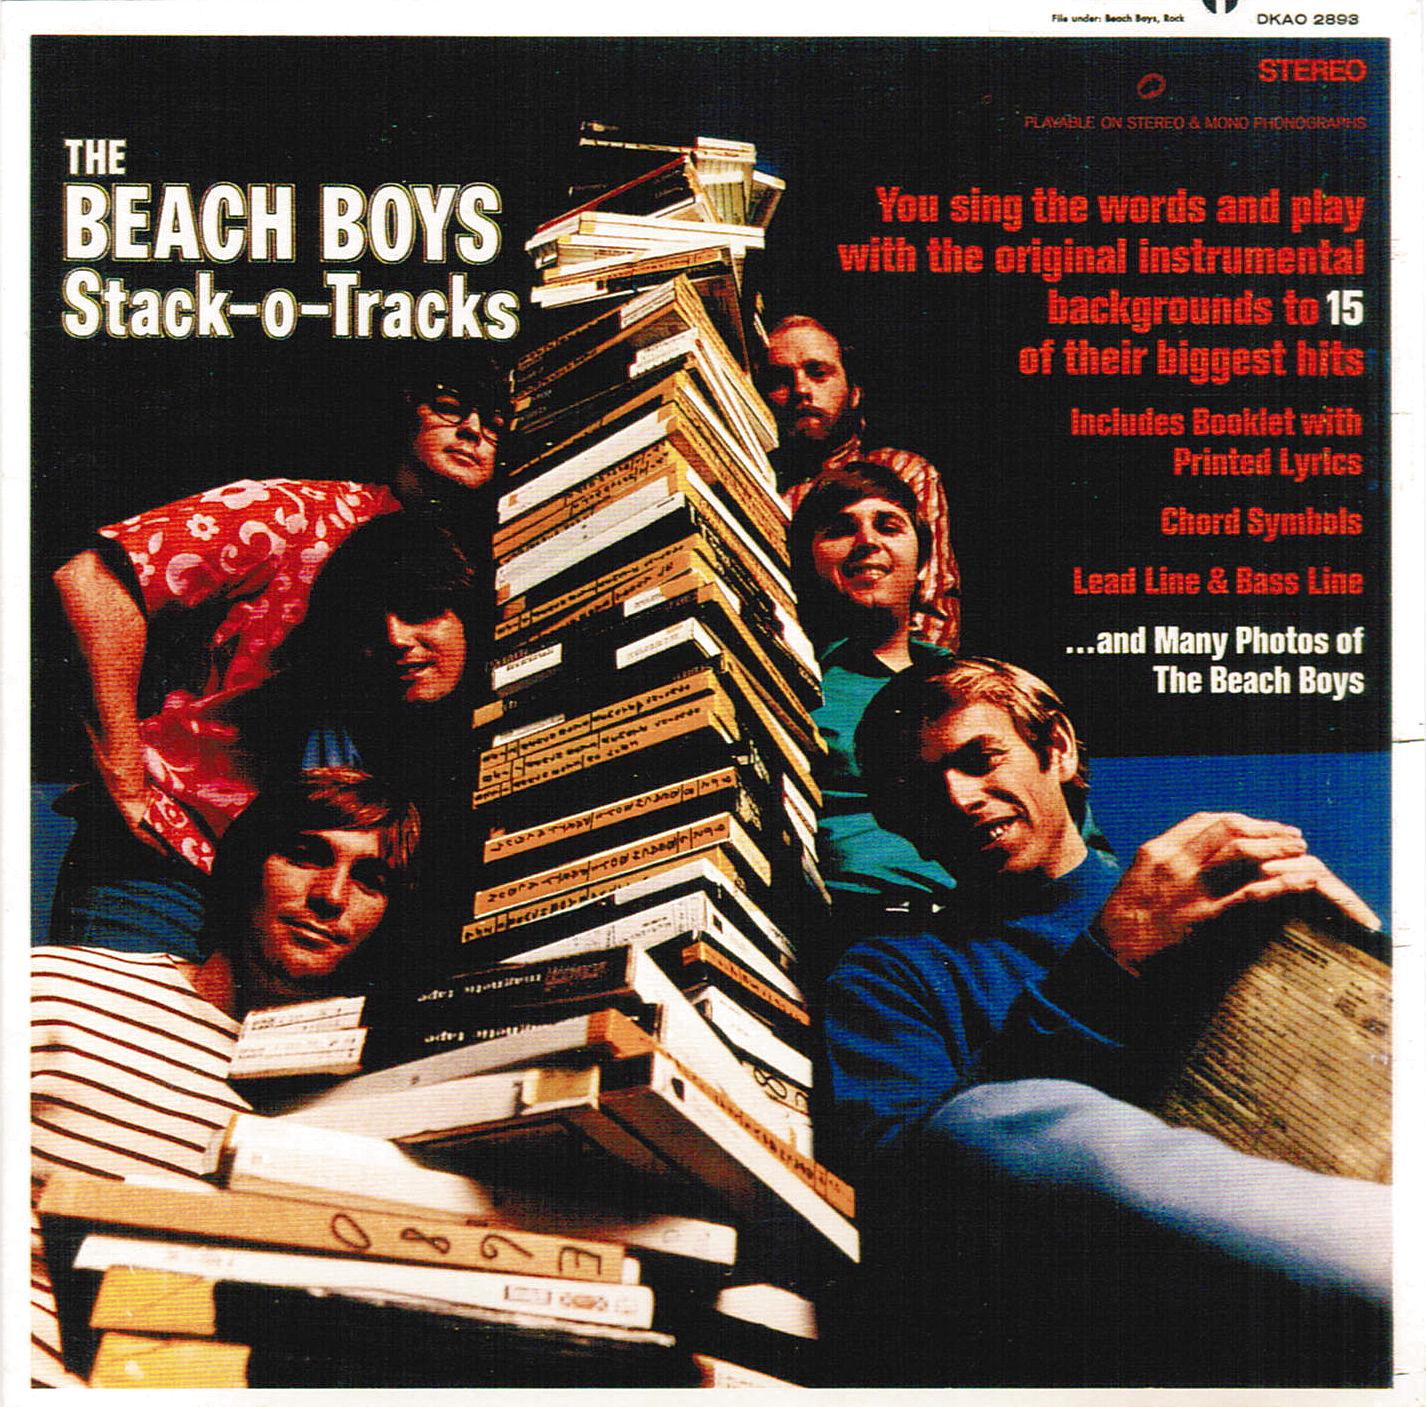 Stack-O-Tracks cover